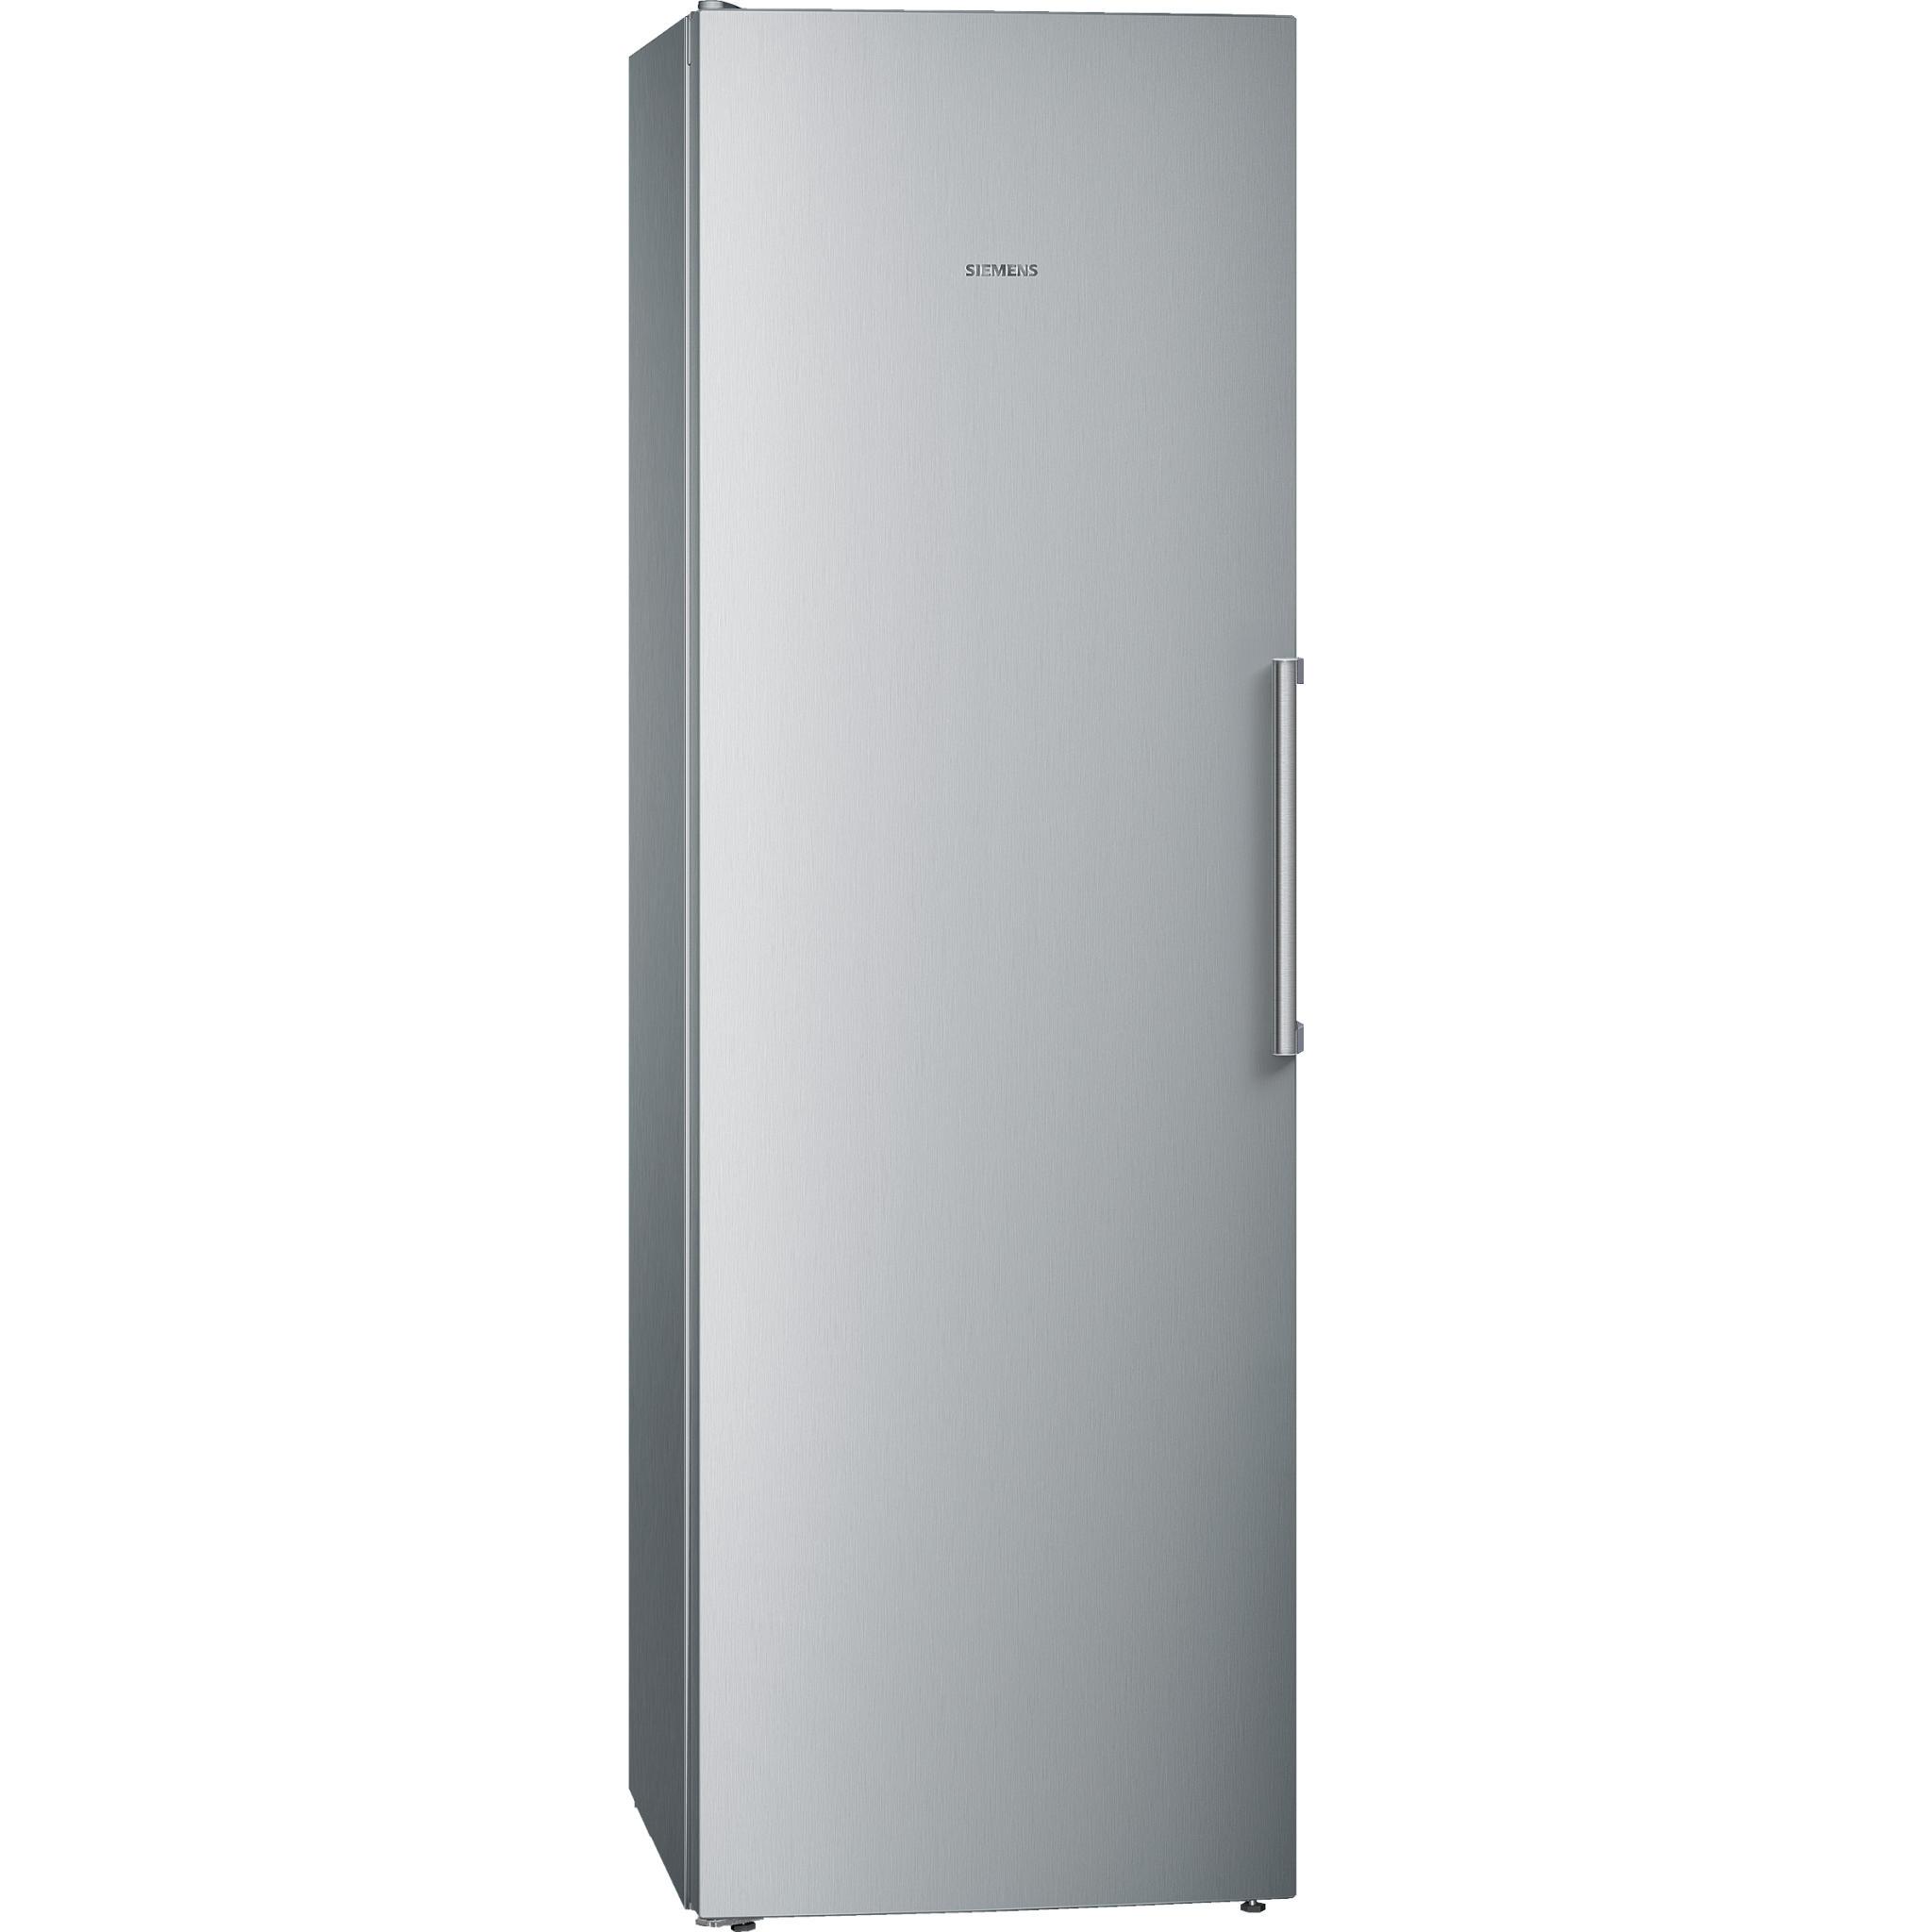 Siemens iQ300 KS36VVI30G Freestanding Fridge